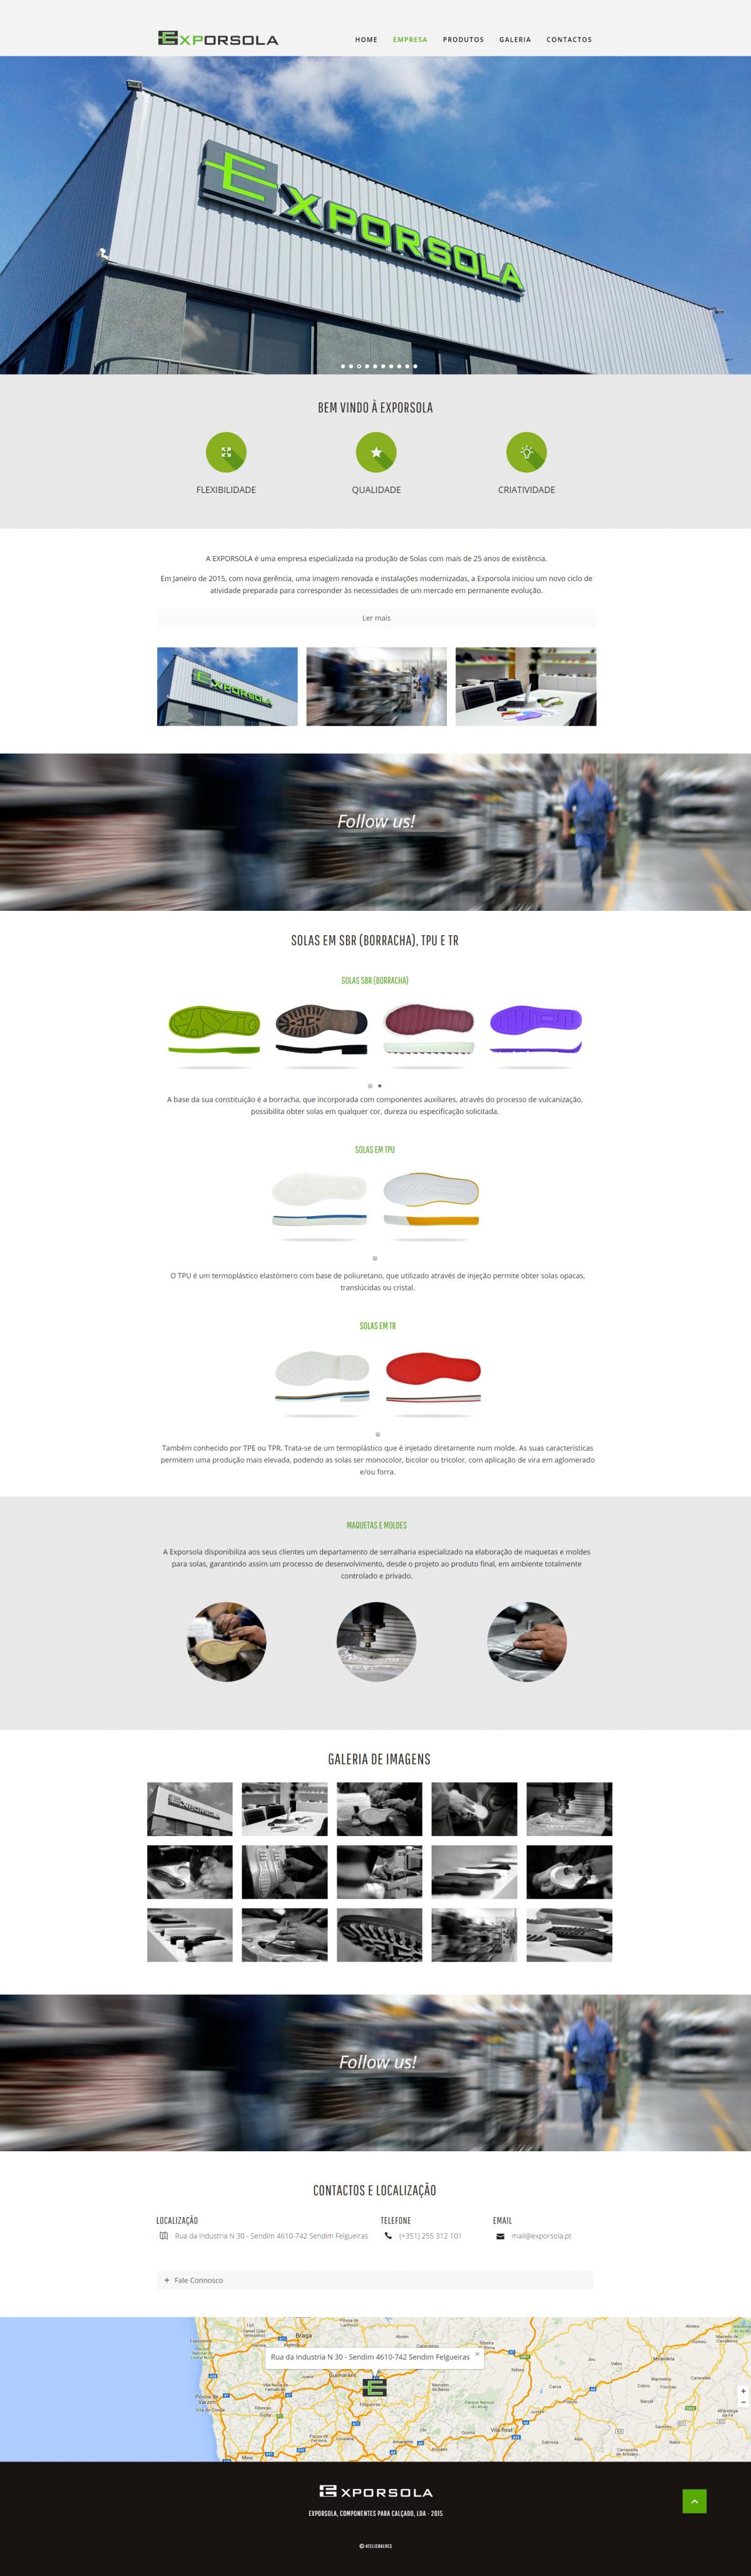 atelier_alves_ricardo_website_exporsola_screen